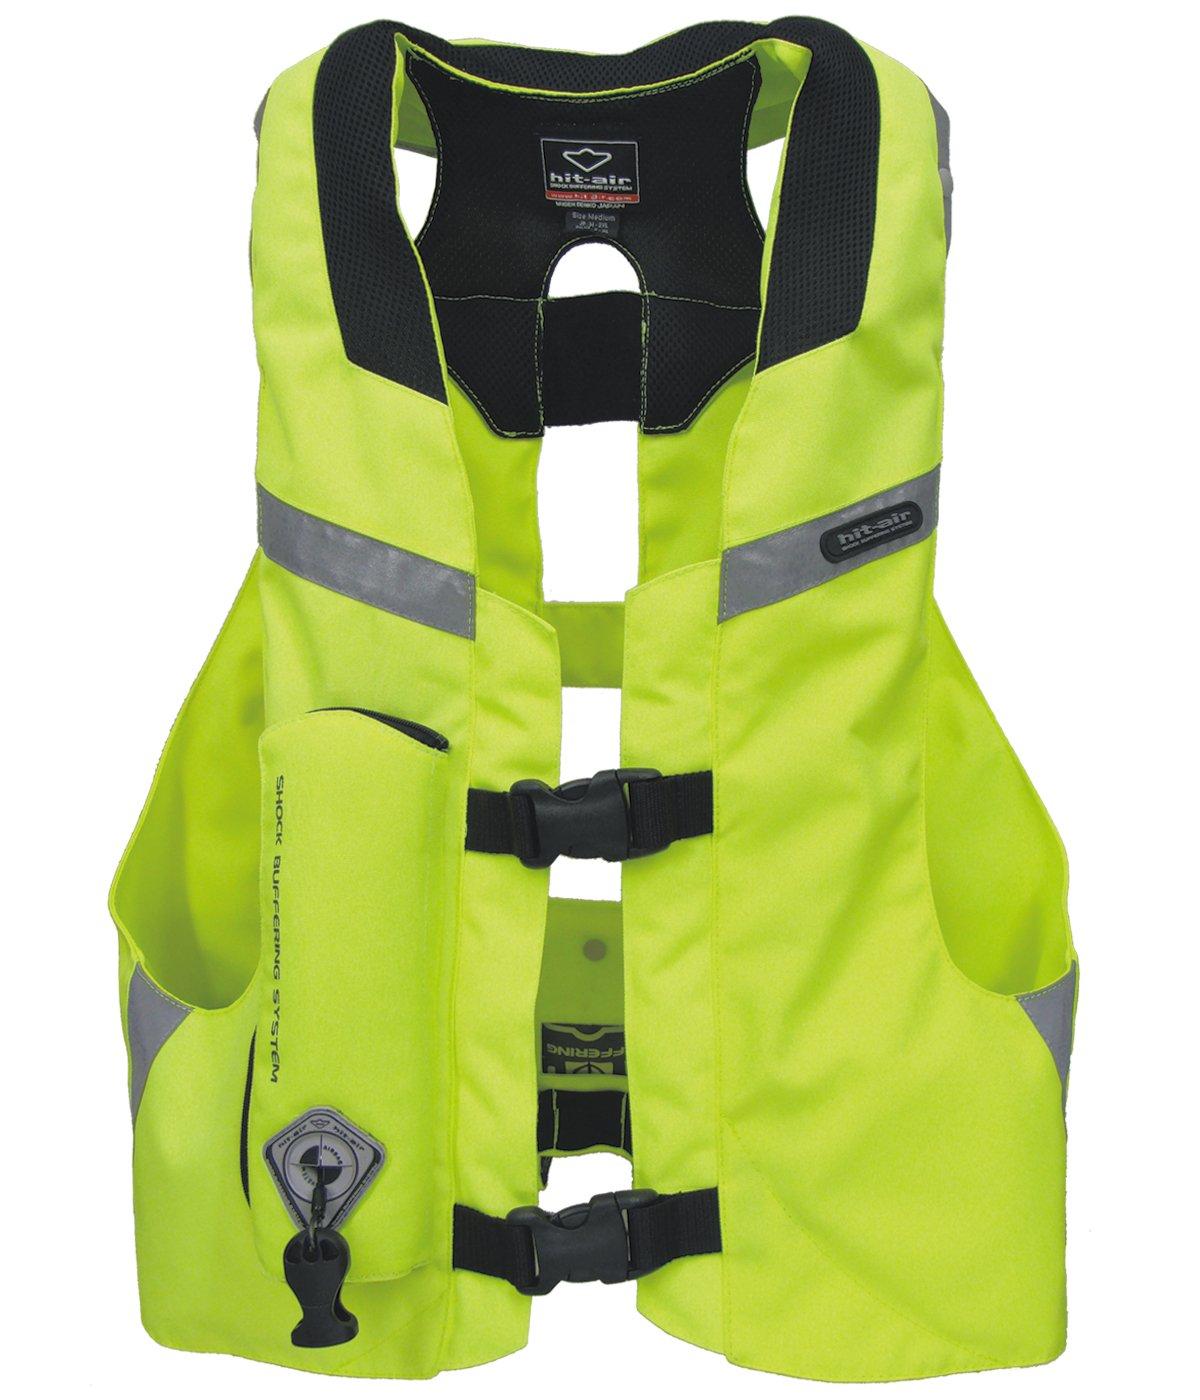 Amazon.com: Hit Air MLV-YC - Chaleco ligero para airbag ...